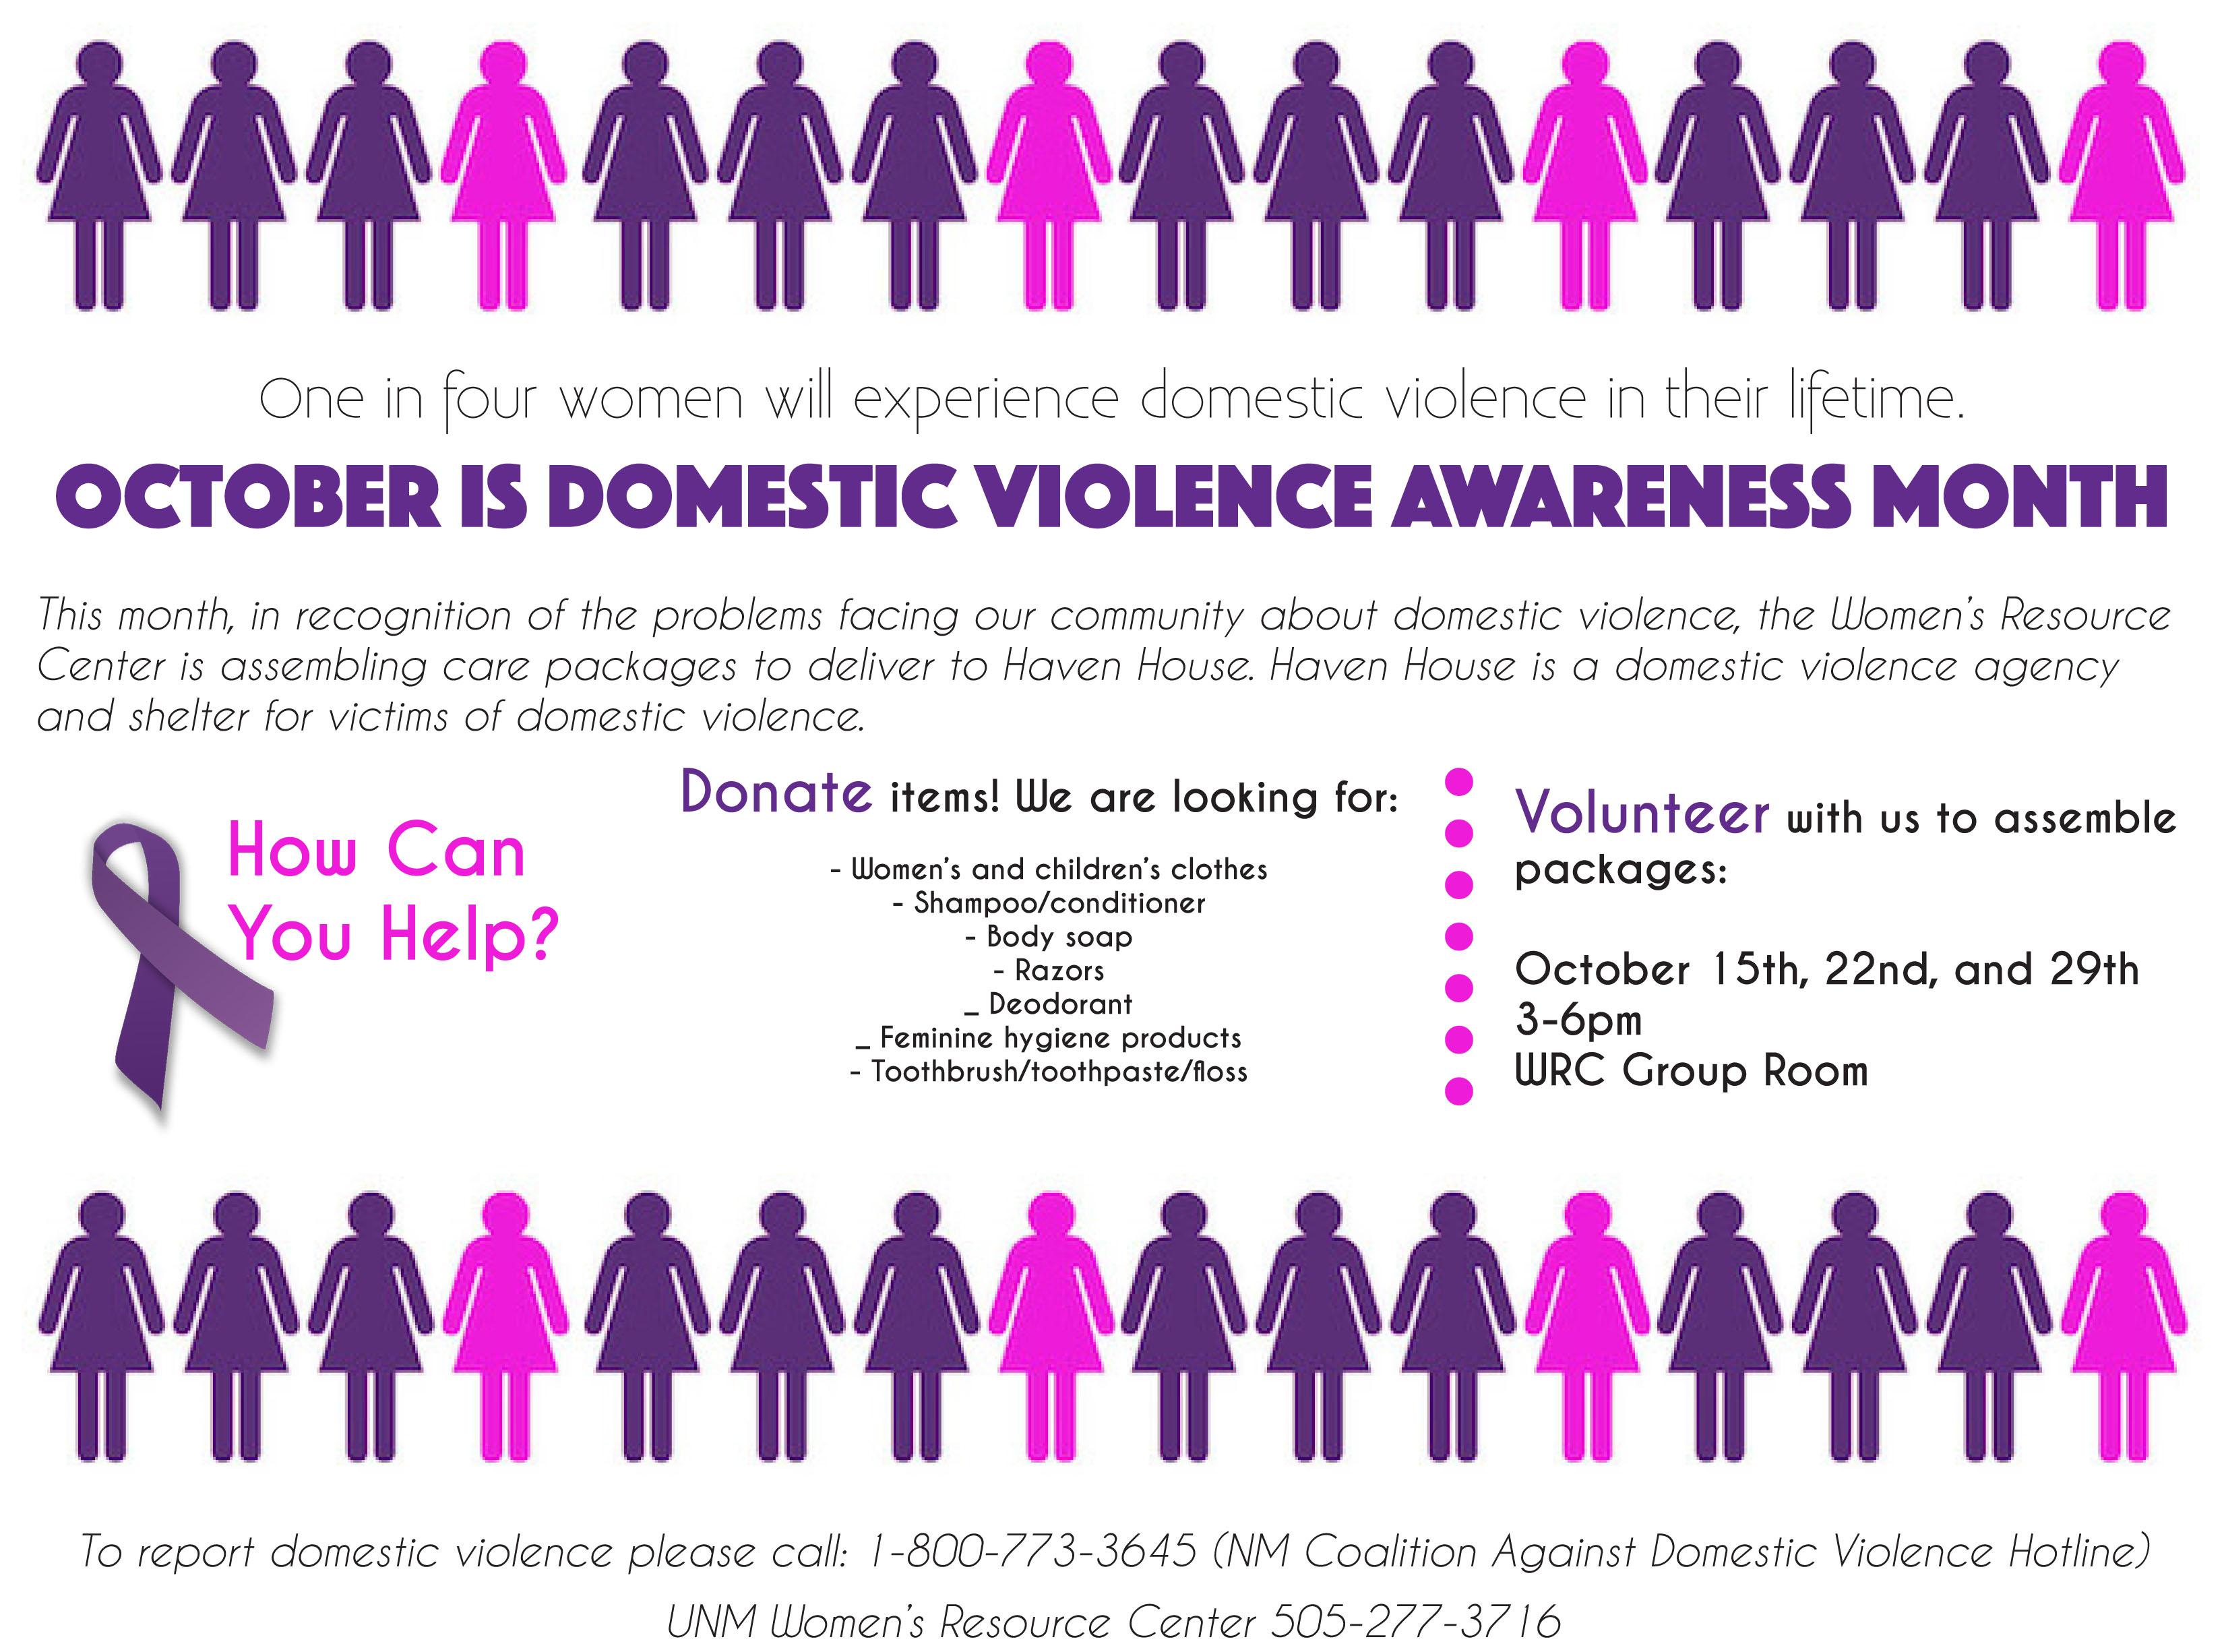 October Awareness Domestic Violence